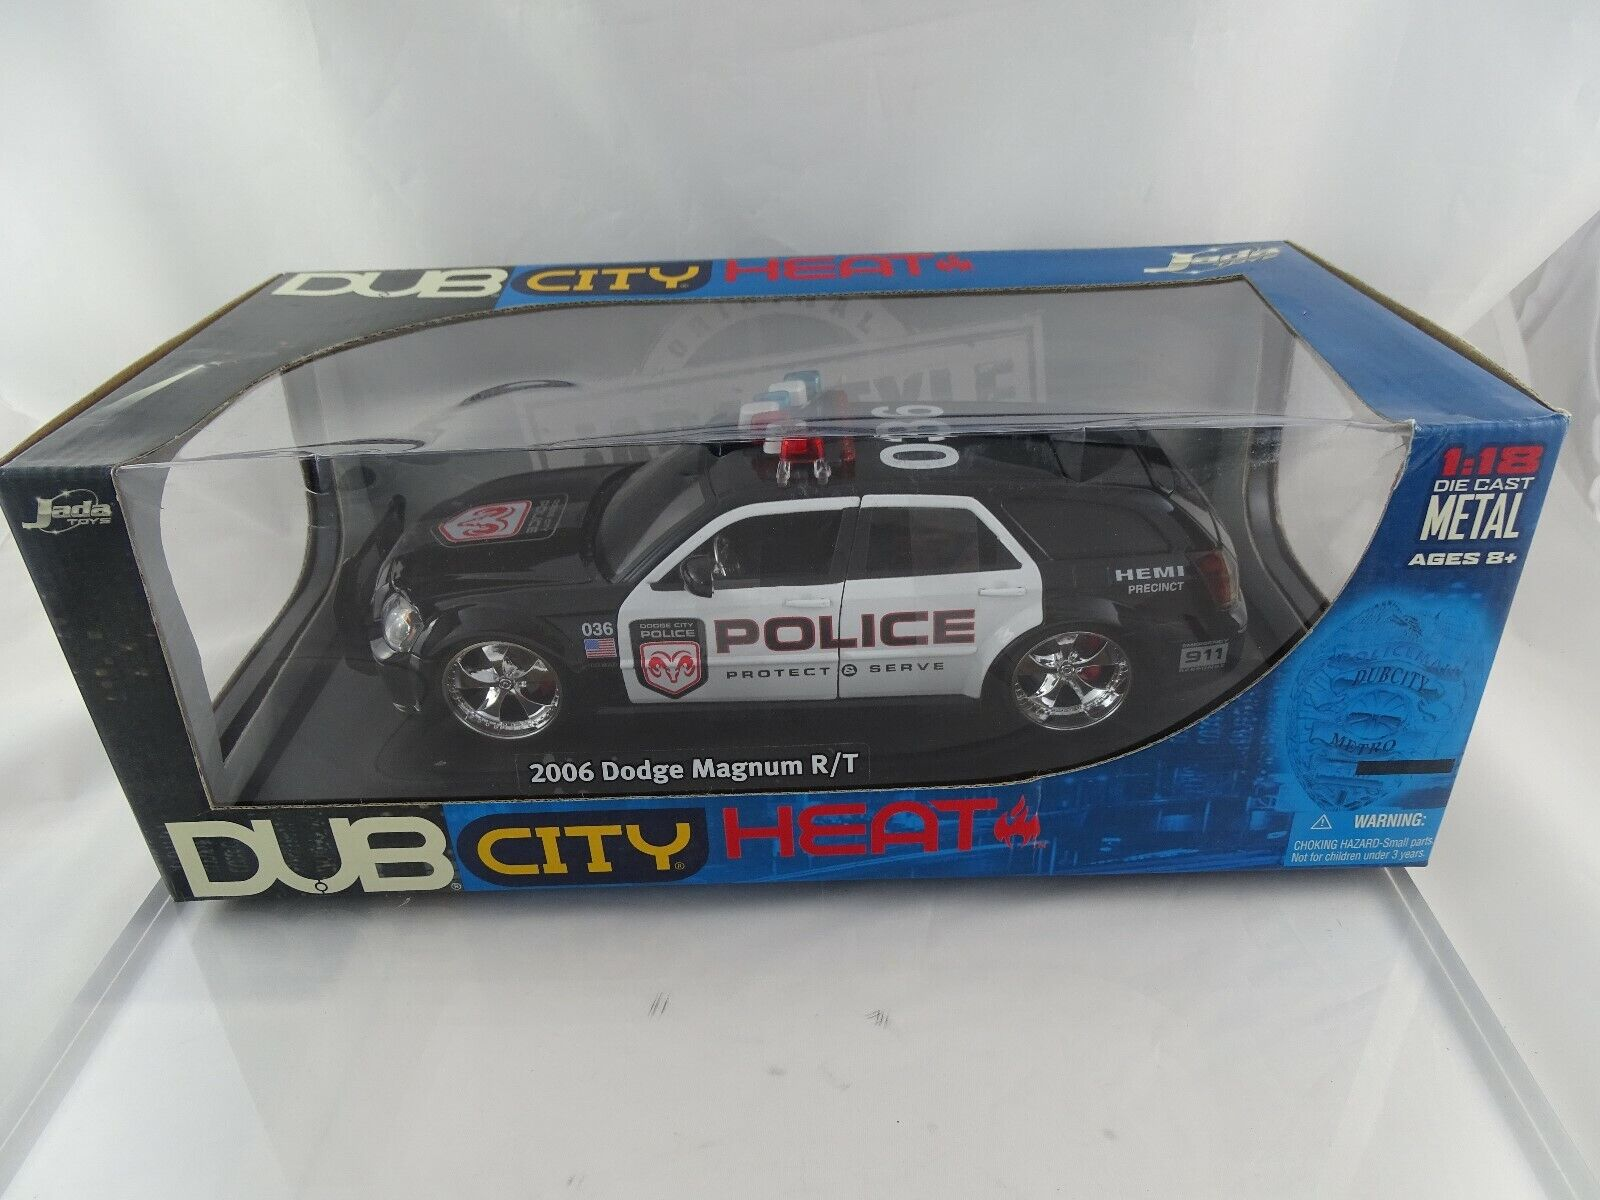 1 18 jada Dub City 90571 2006 Dodge Magnum R T Police prossoect serve nuevo en el embalaje original